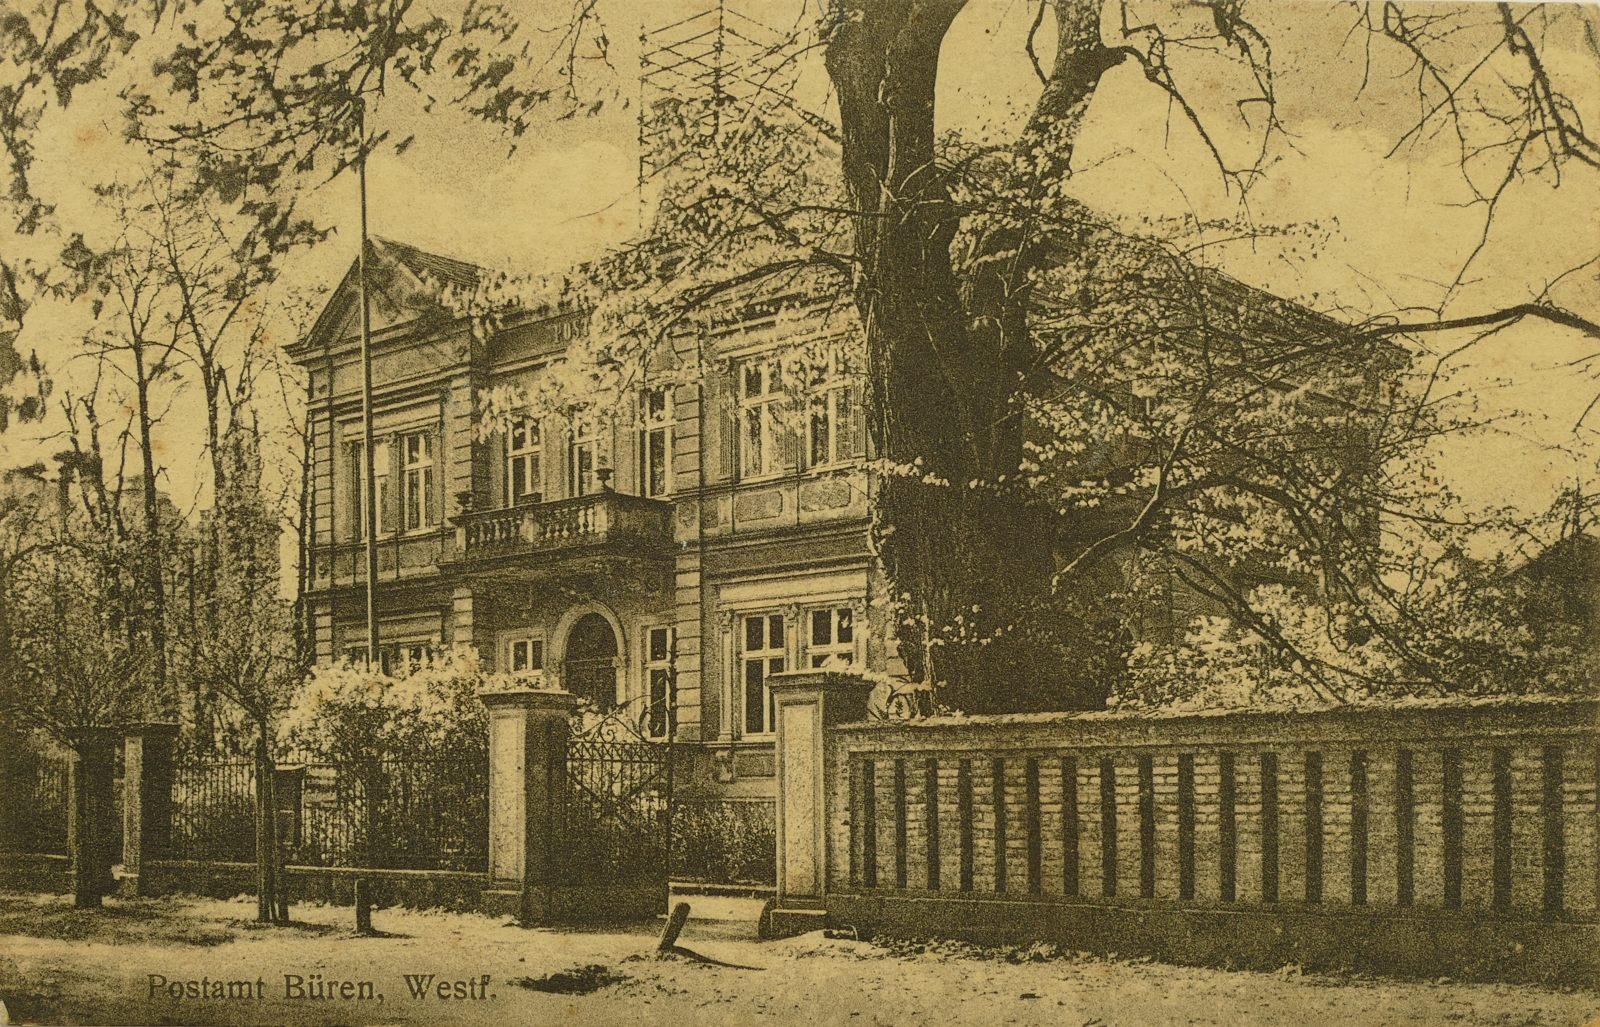 Postamt in den 1910ern